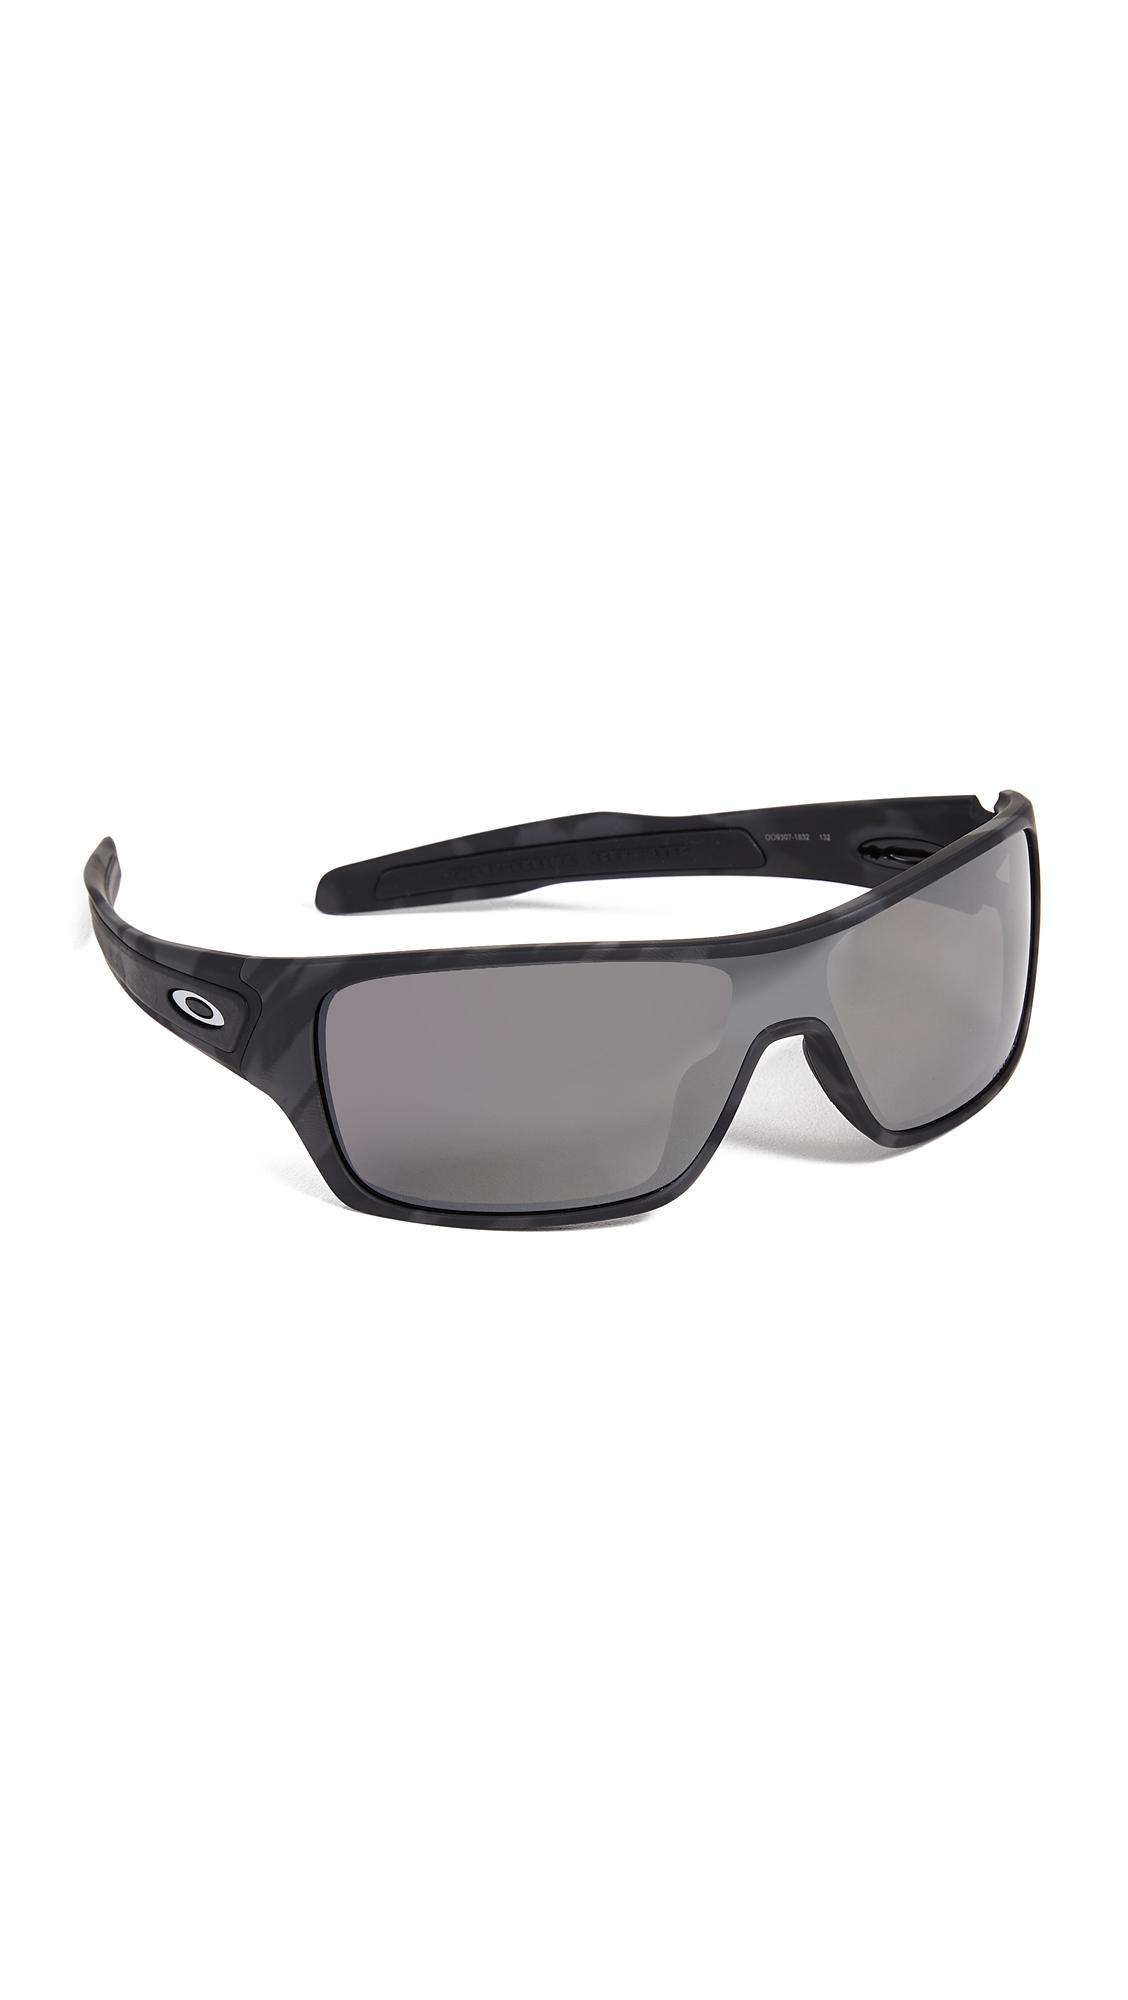 5748f67692 Oakley Turbine Rotor Polarized Sunglasses in Black for Men - Lyst